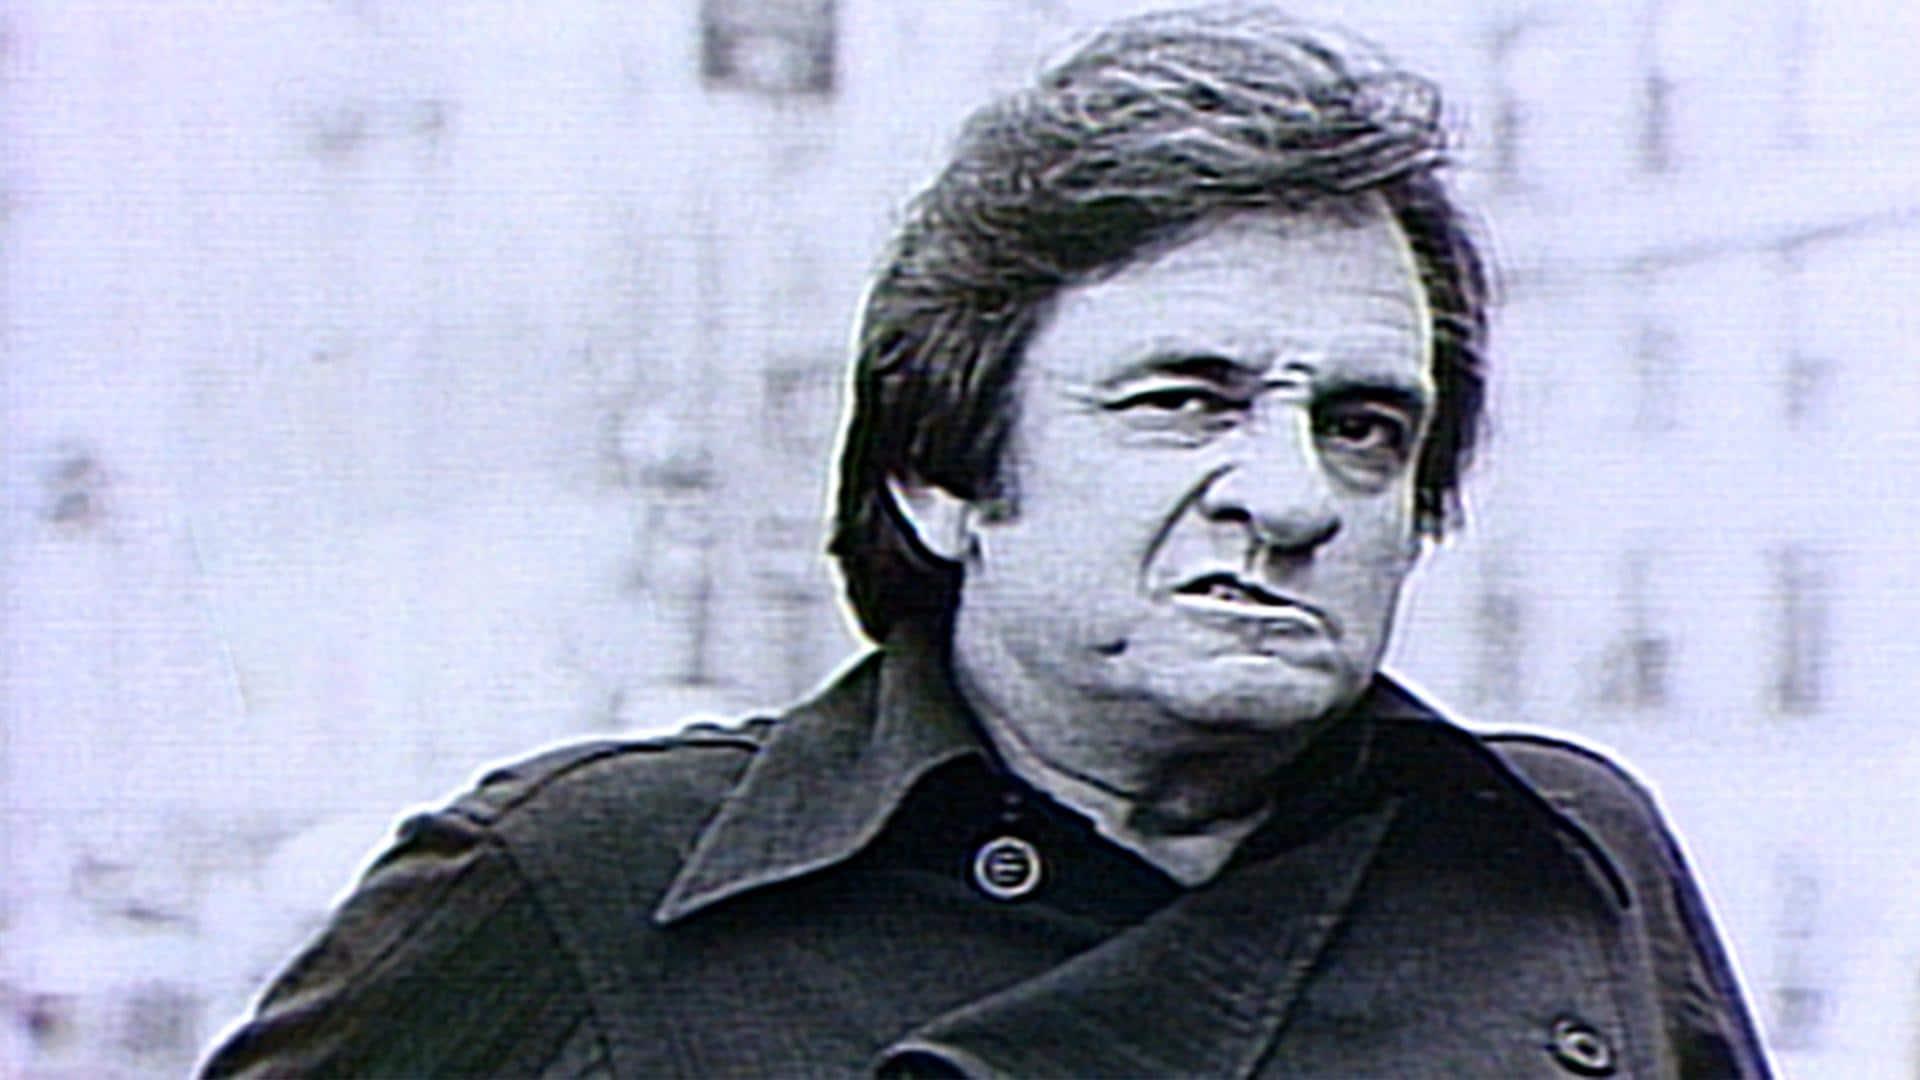 Johnny Cash: April 17, 1982